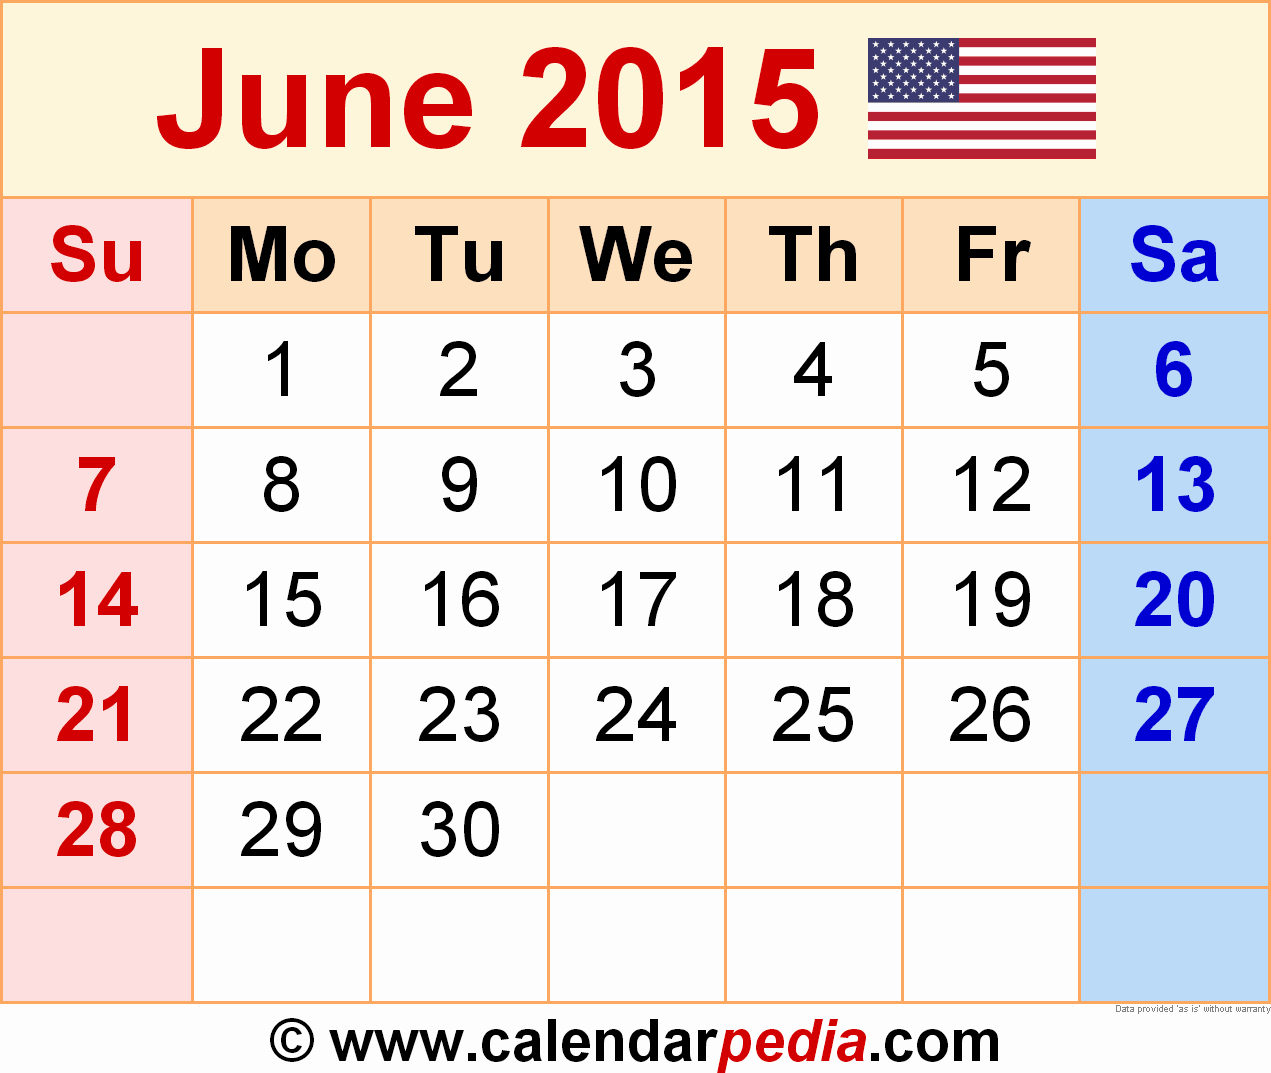 Calendar Template for June 2015 Fresh June 2015 Calendars for Word Excel & Pdf